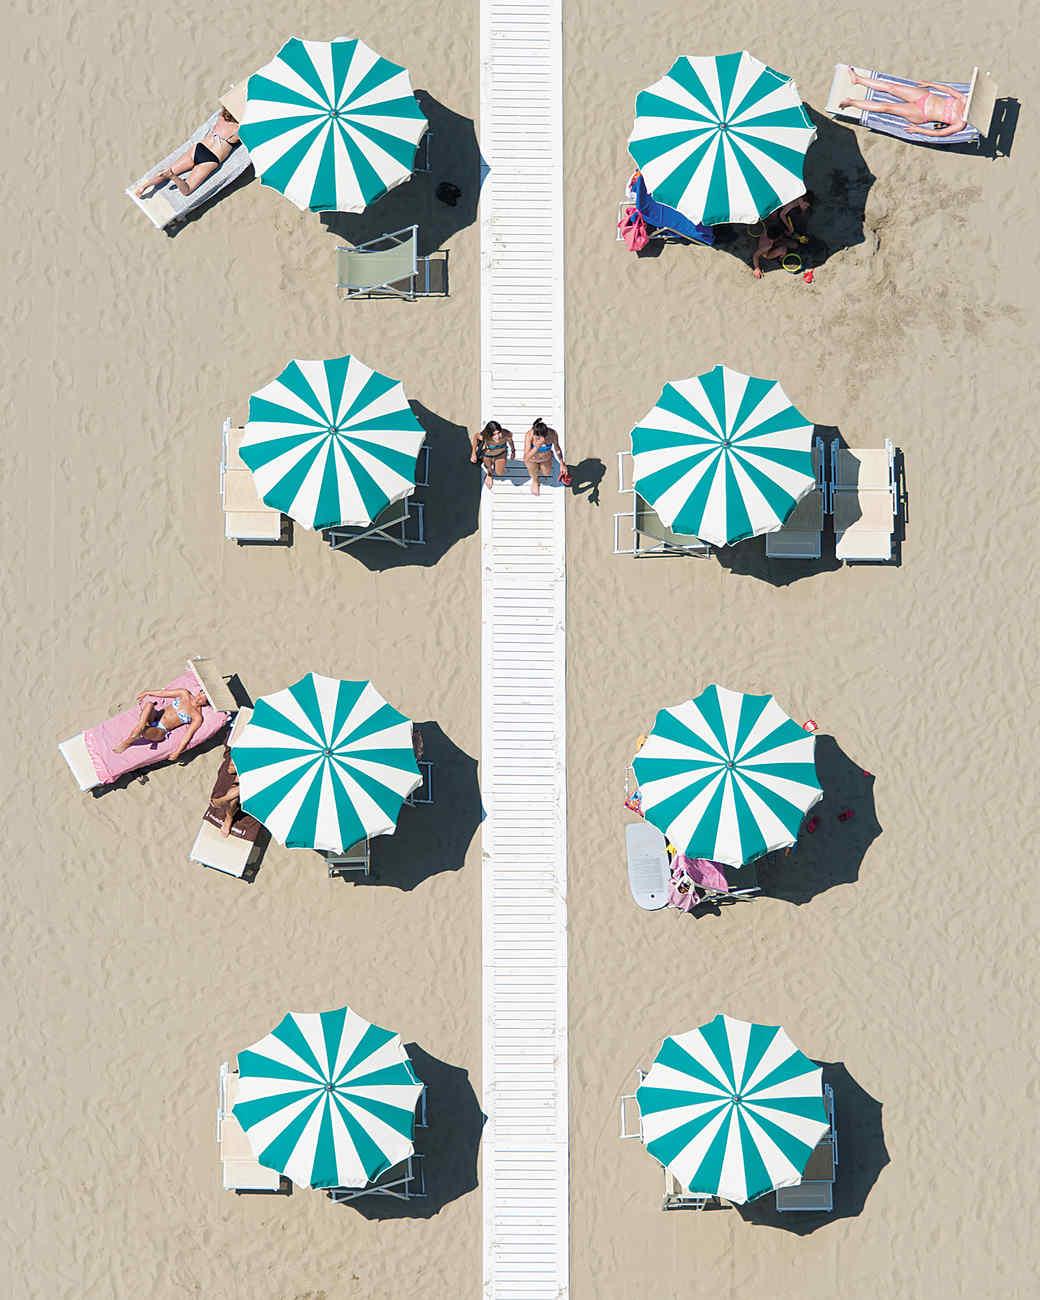 beaches_p089.jpg